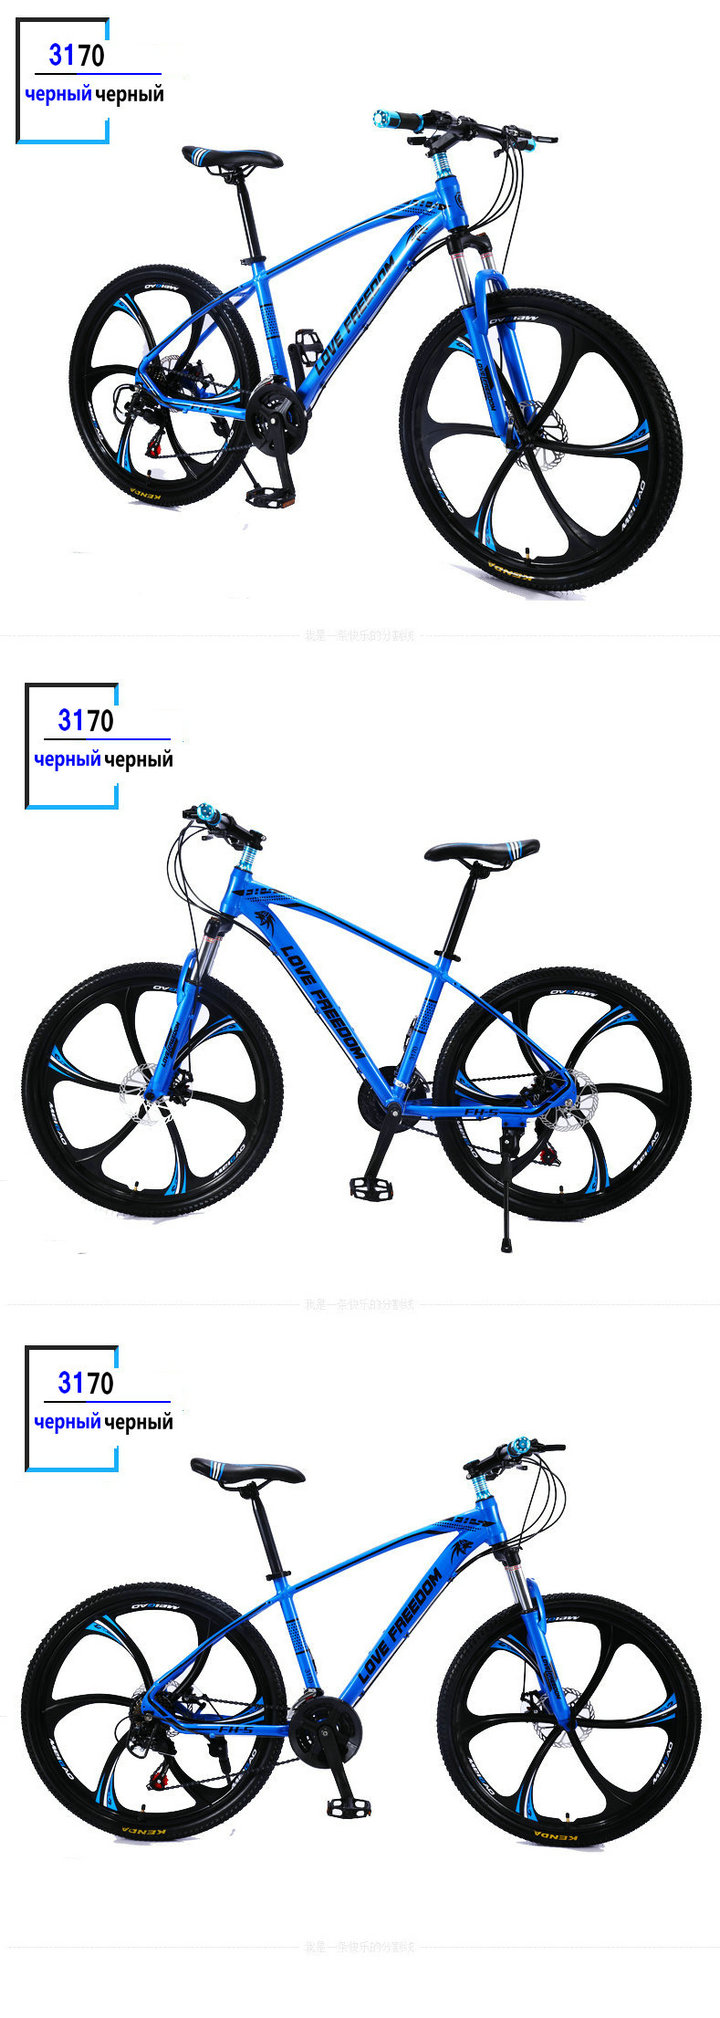 HTB1OqGGa21H3KVjSZFHq6zKppXar Love Freedom 21 speed 26 inch mountain bike bicycles double disc brakes student bike Bicicleta road bike Free Delivery